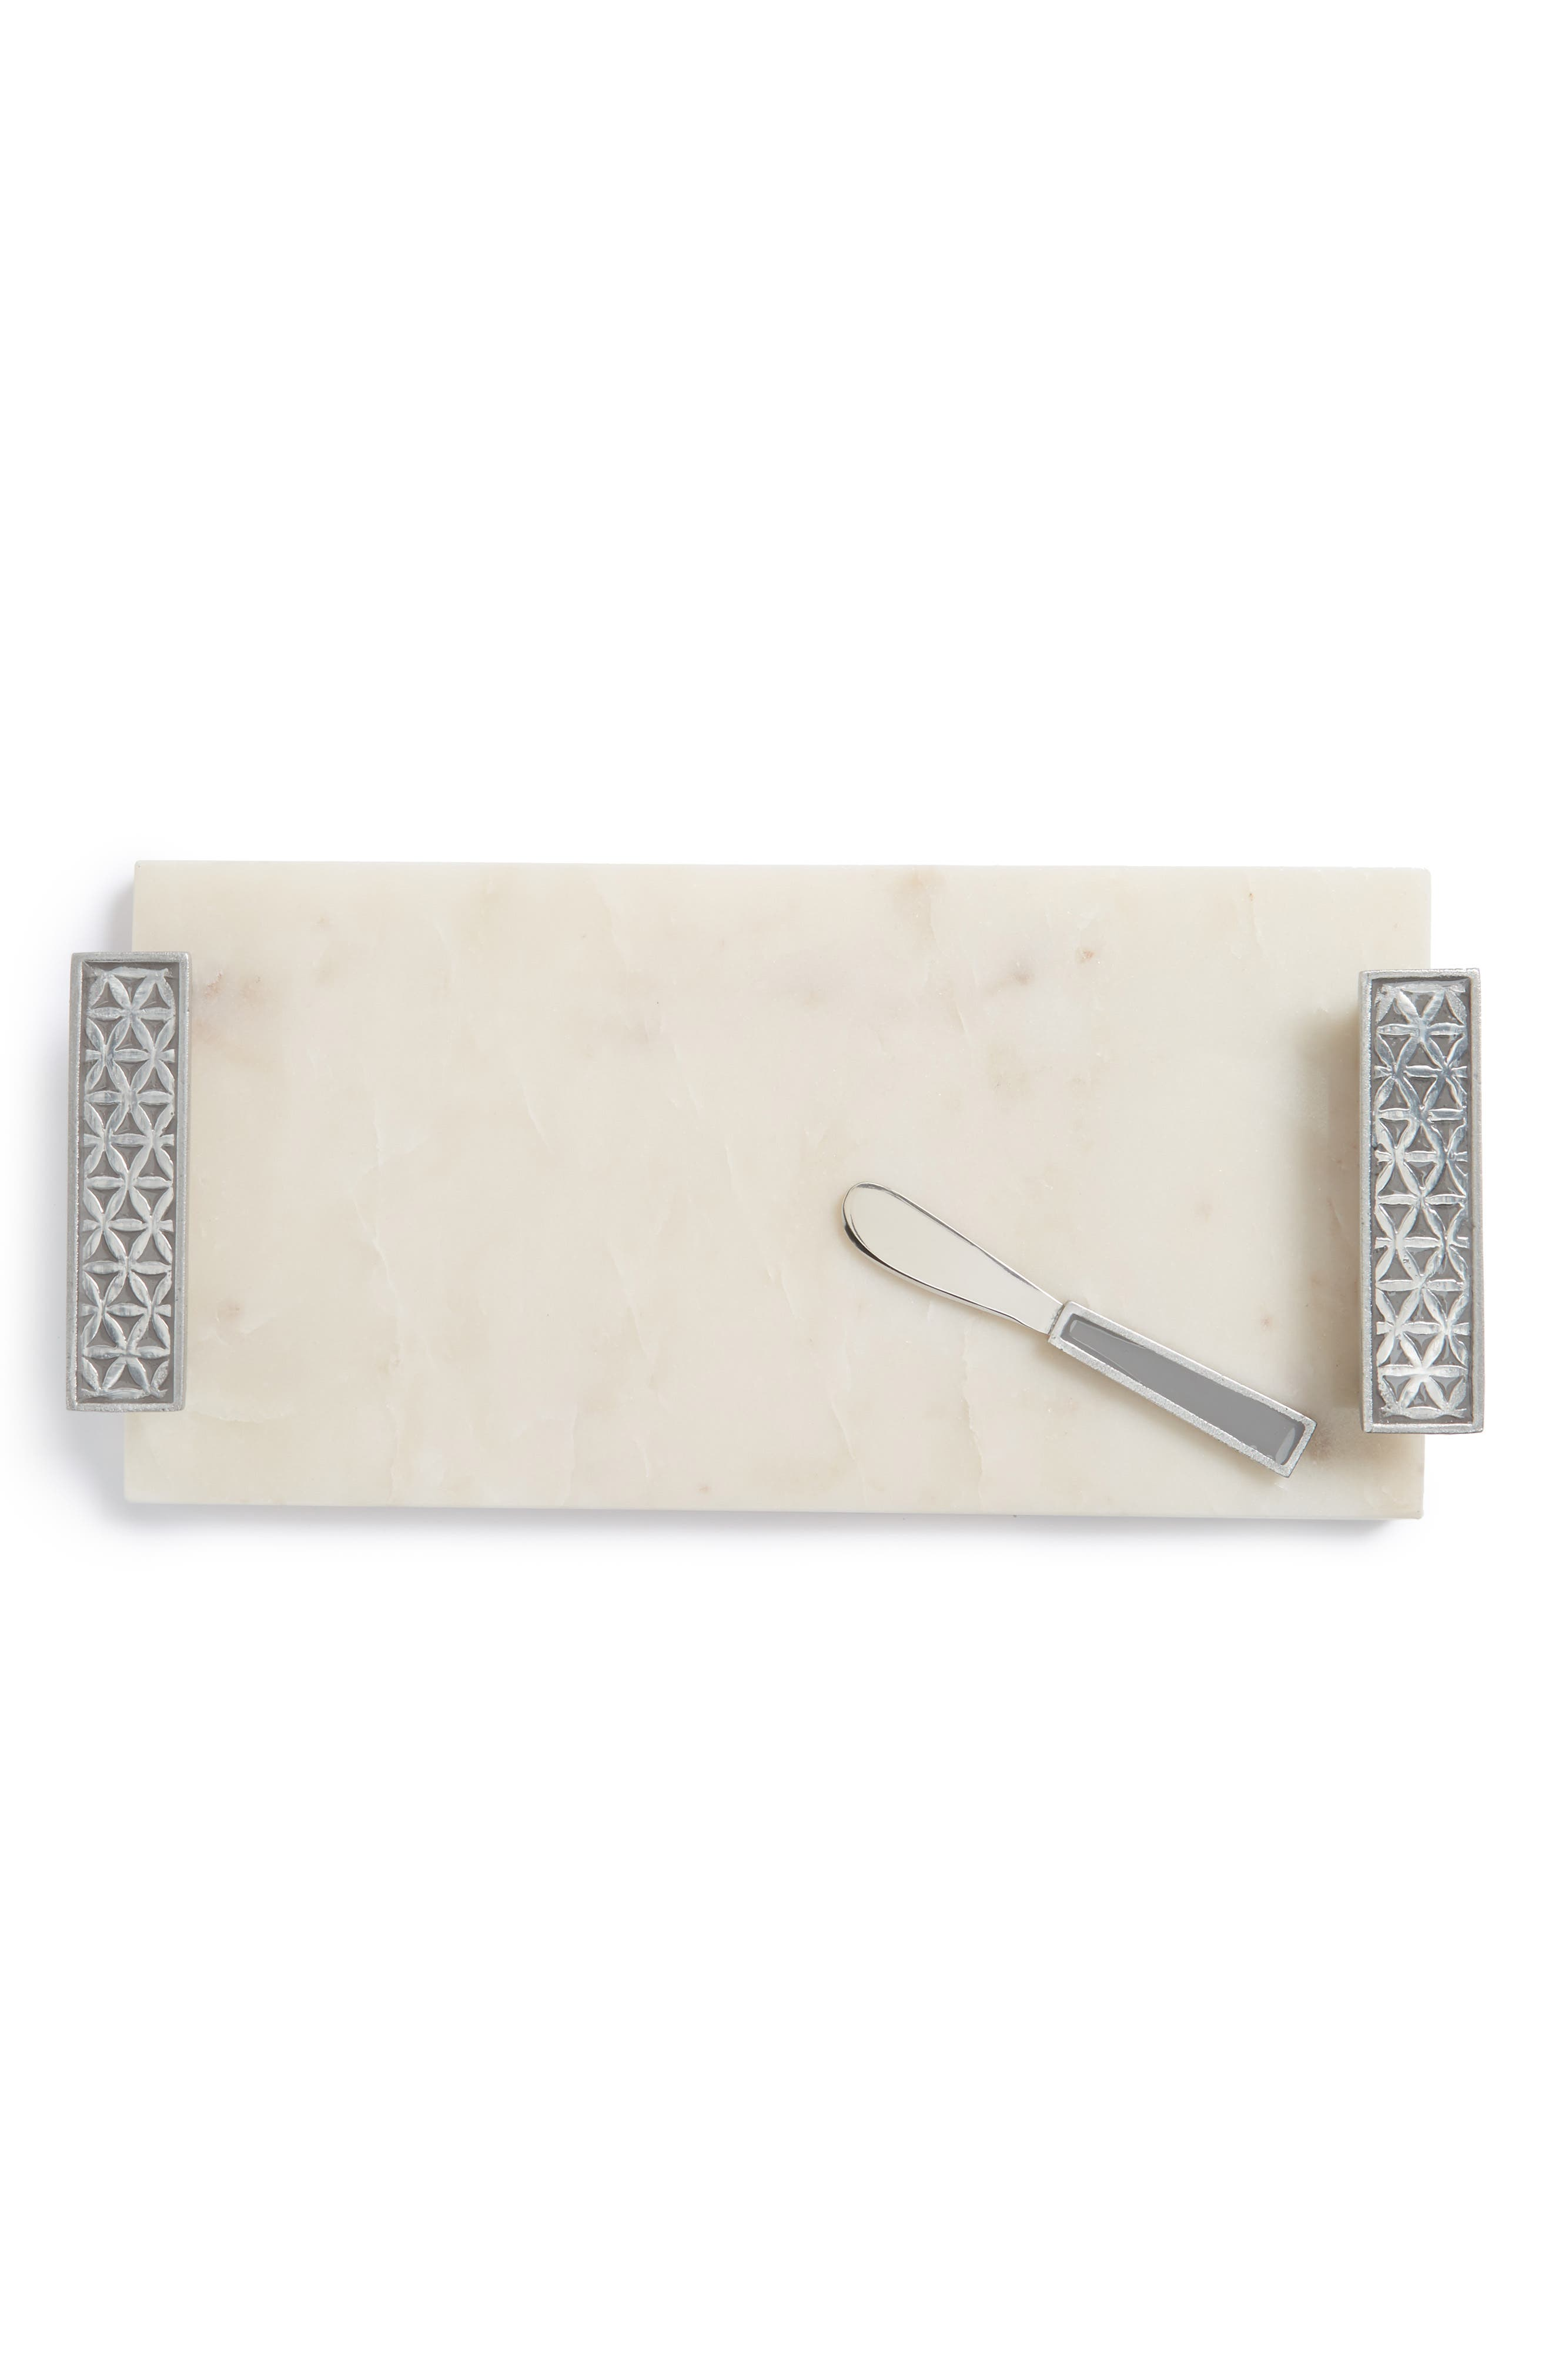 Flower of Life Cheese Board & Spreader,                         Main,                         color, Medium Grey